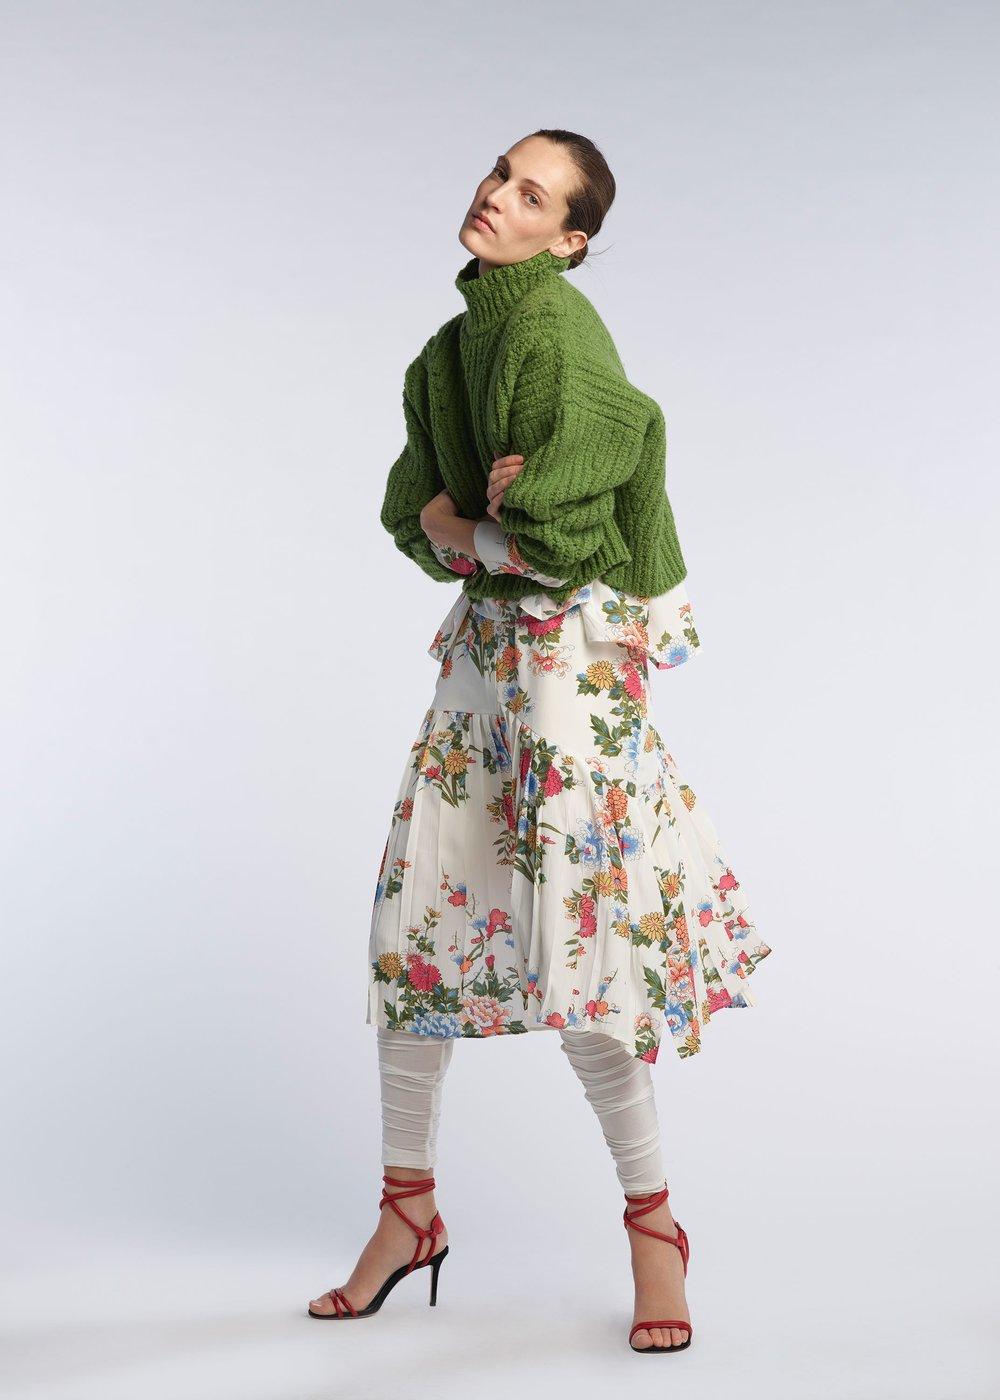 Isabel Marant pre fall 2017 fashionado